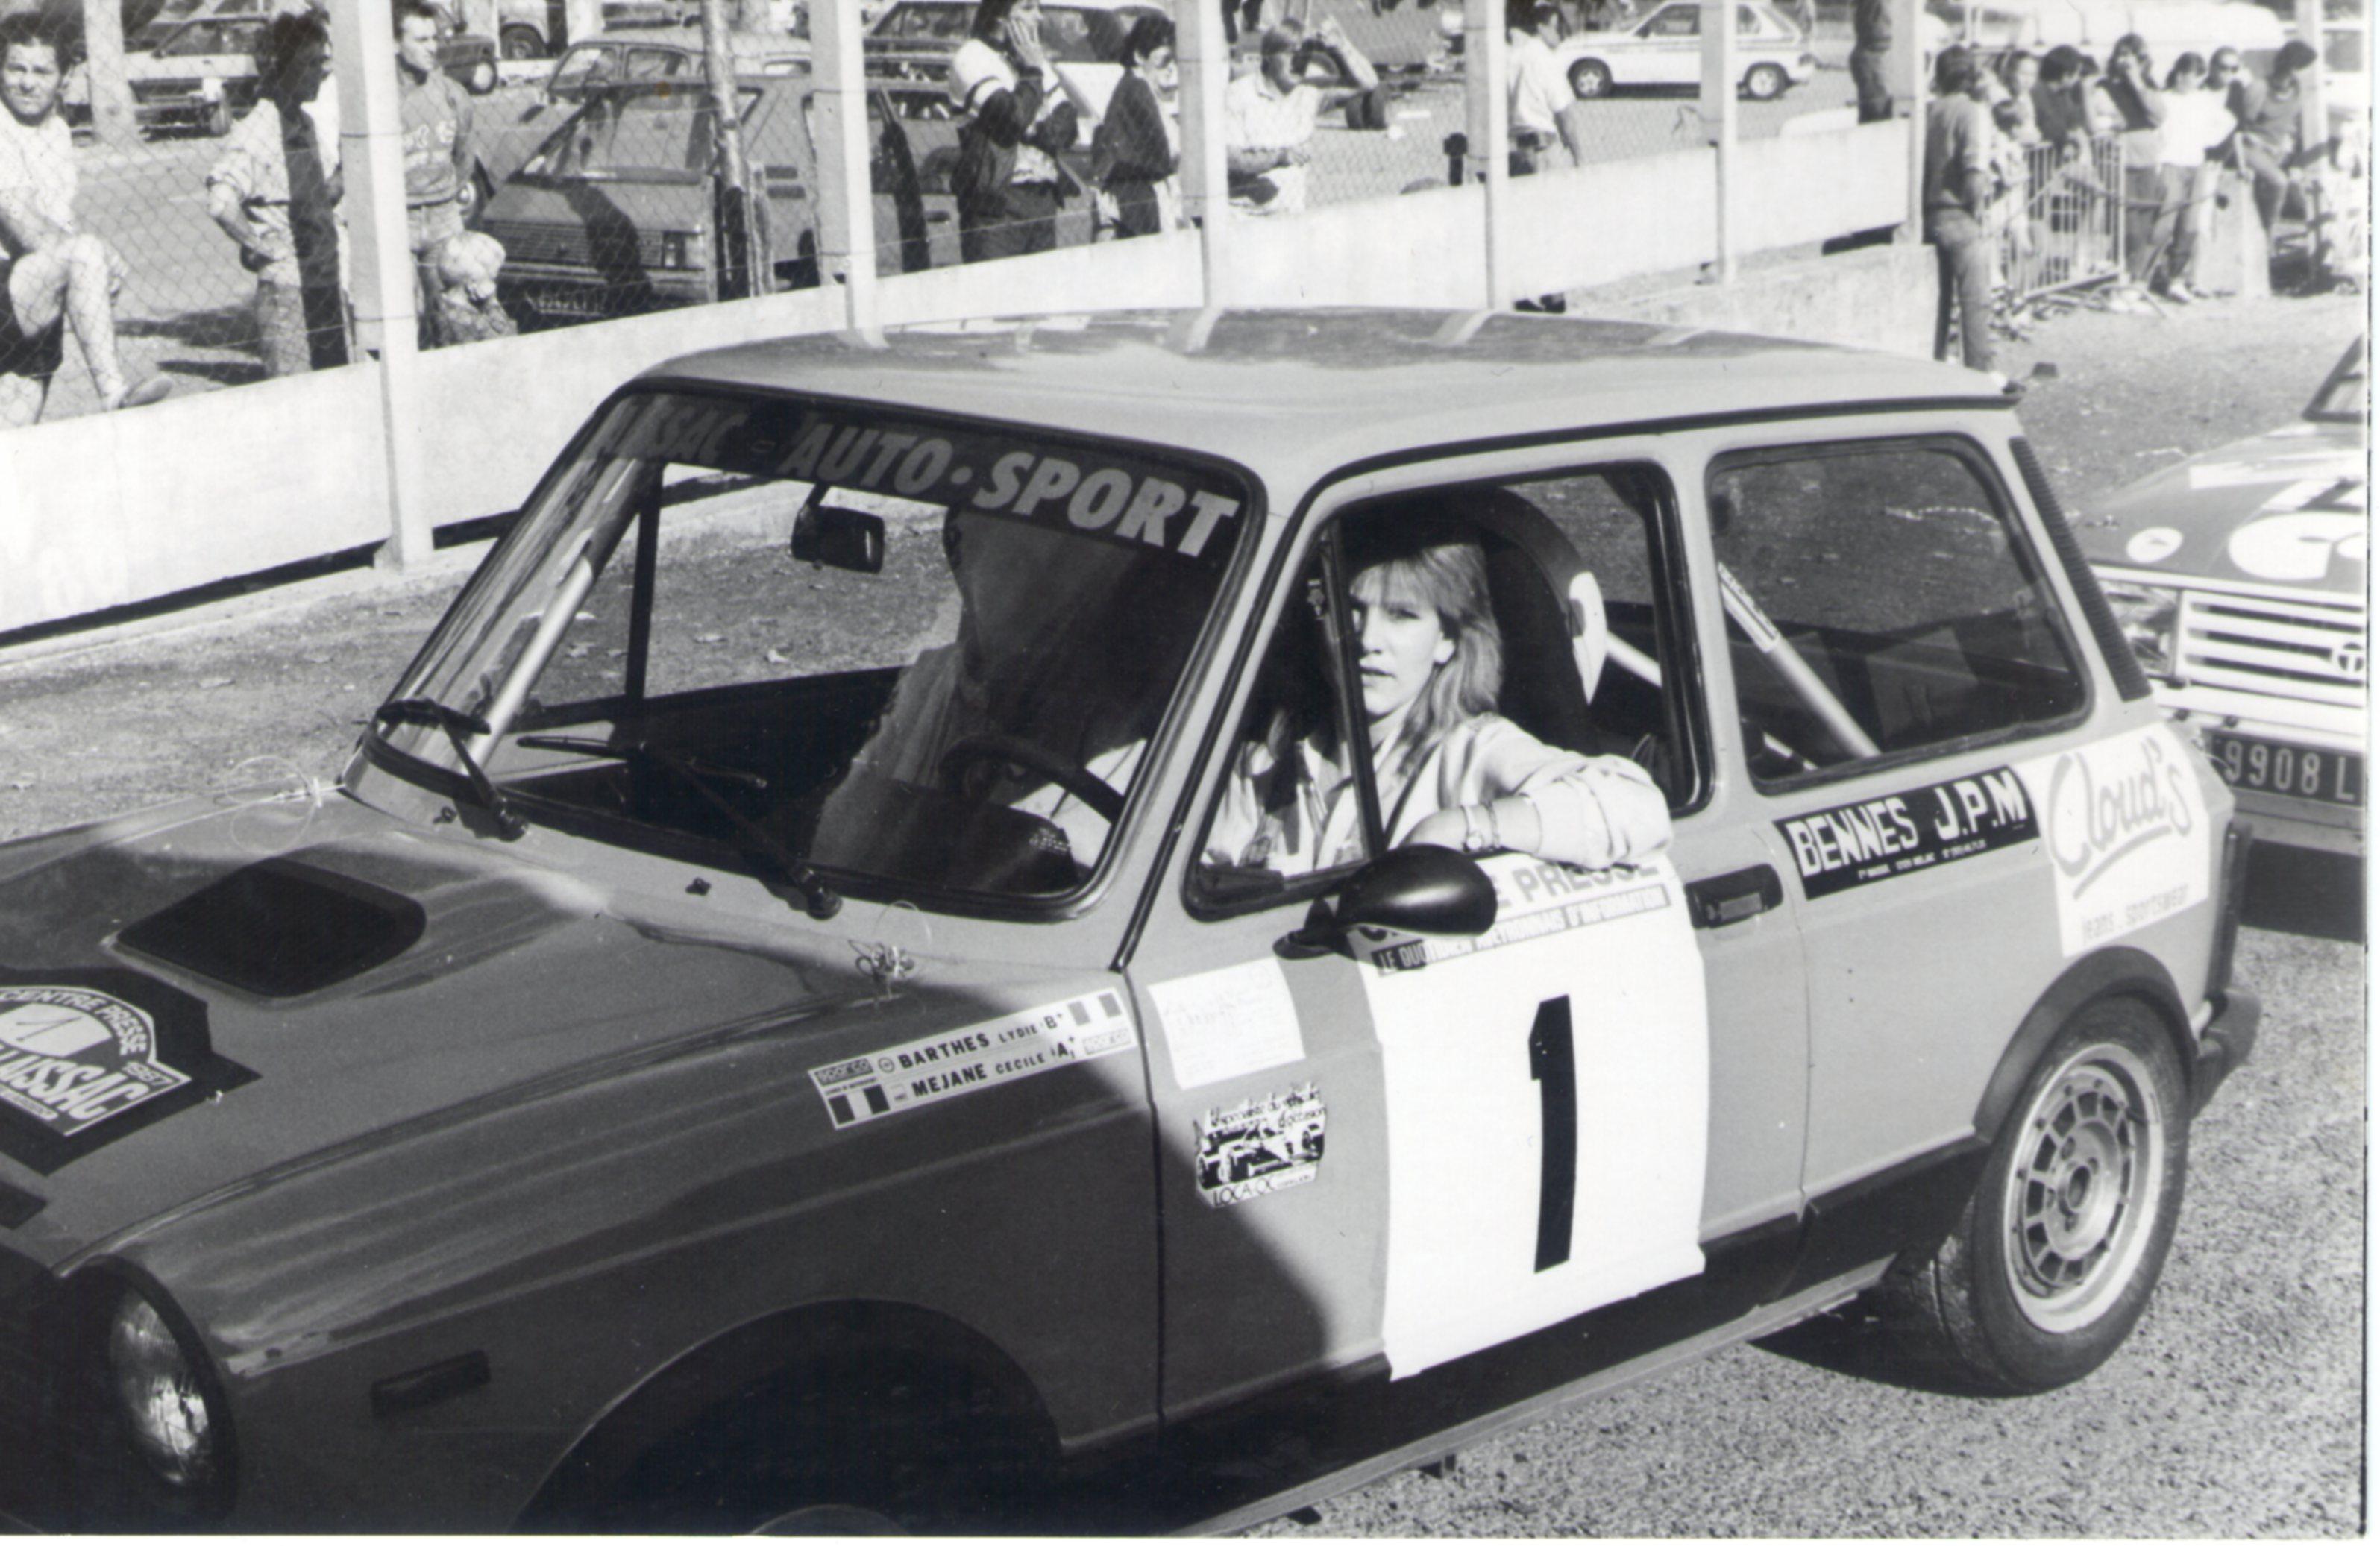 1973 1986: